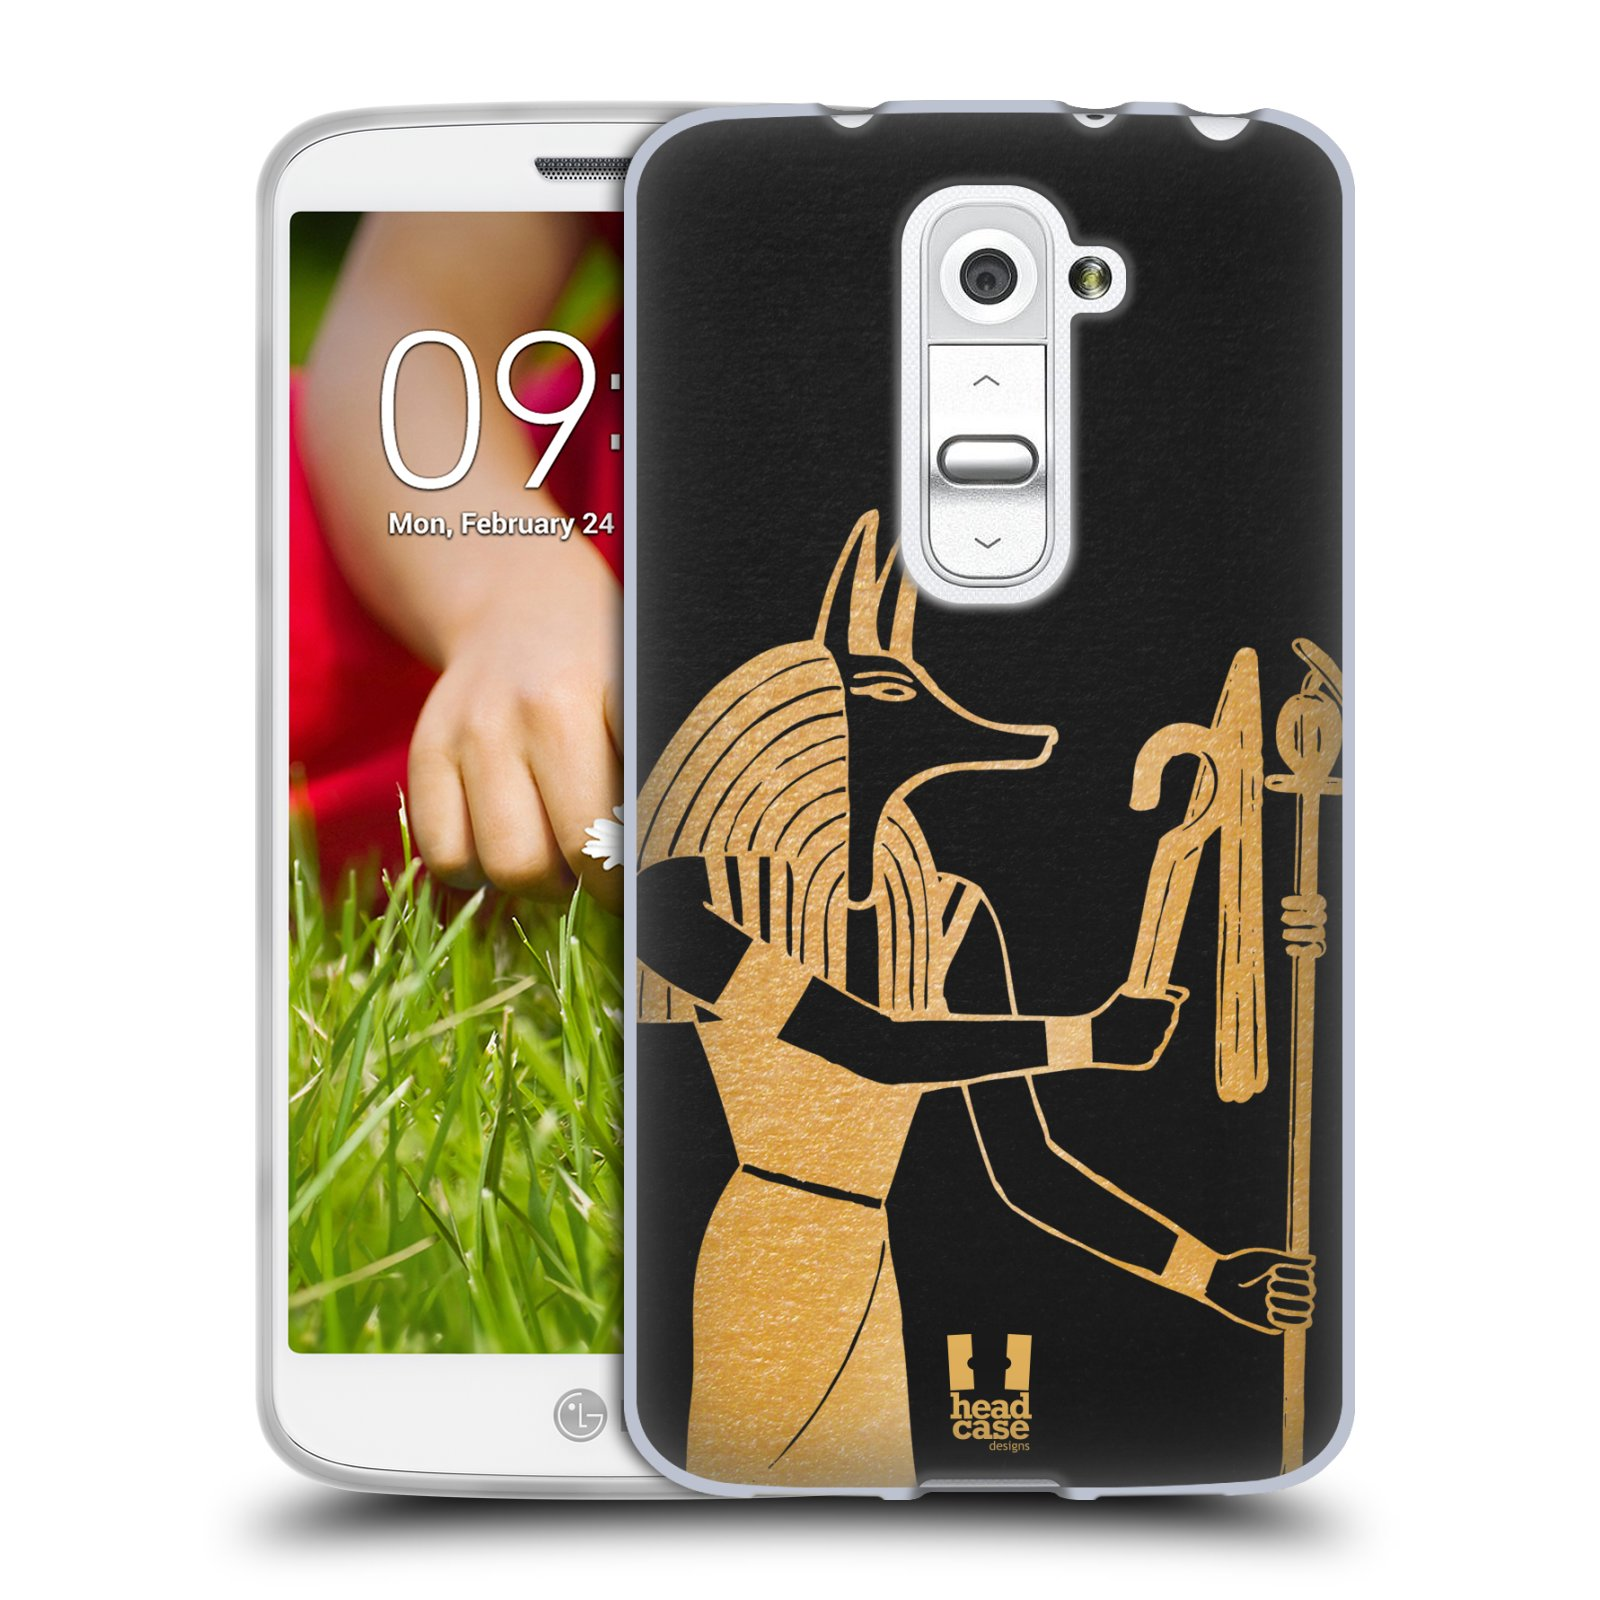 Silikonové pouzdro na mobil LG G2 Mini HEAD CASE EGYPT ANUBIS (Silikonový kryt či obal na mobilní telefon LG G2 Mini D620)